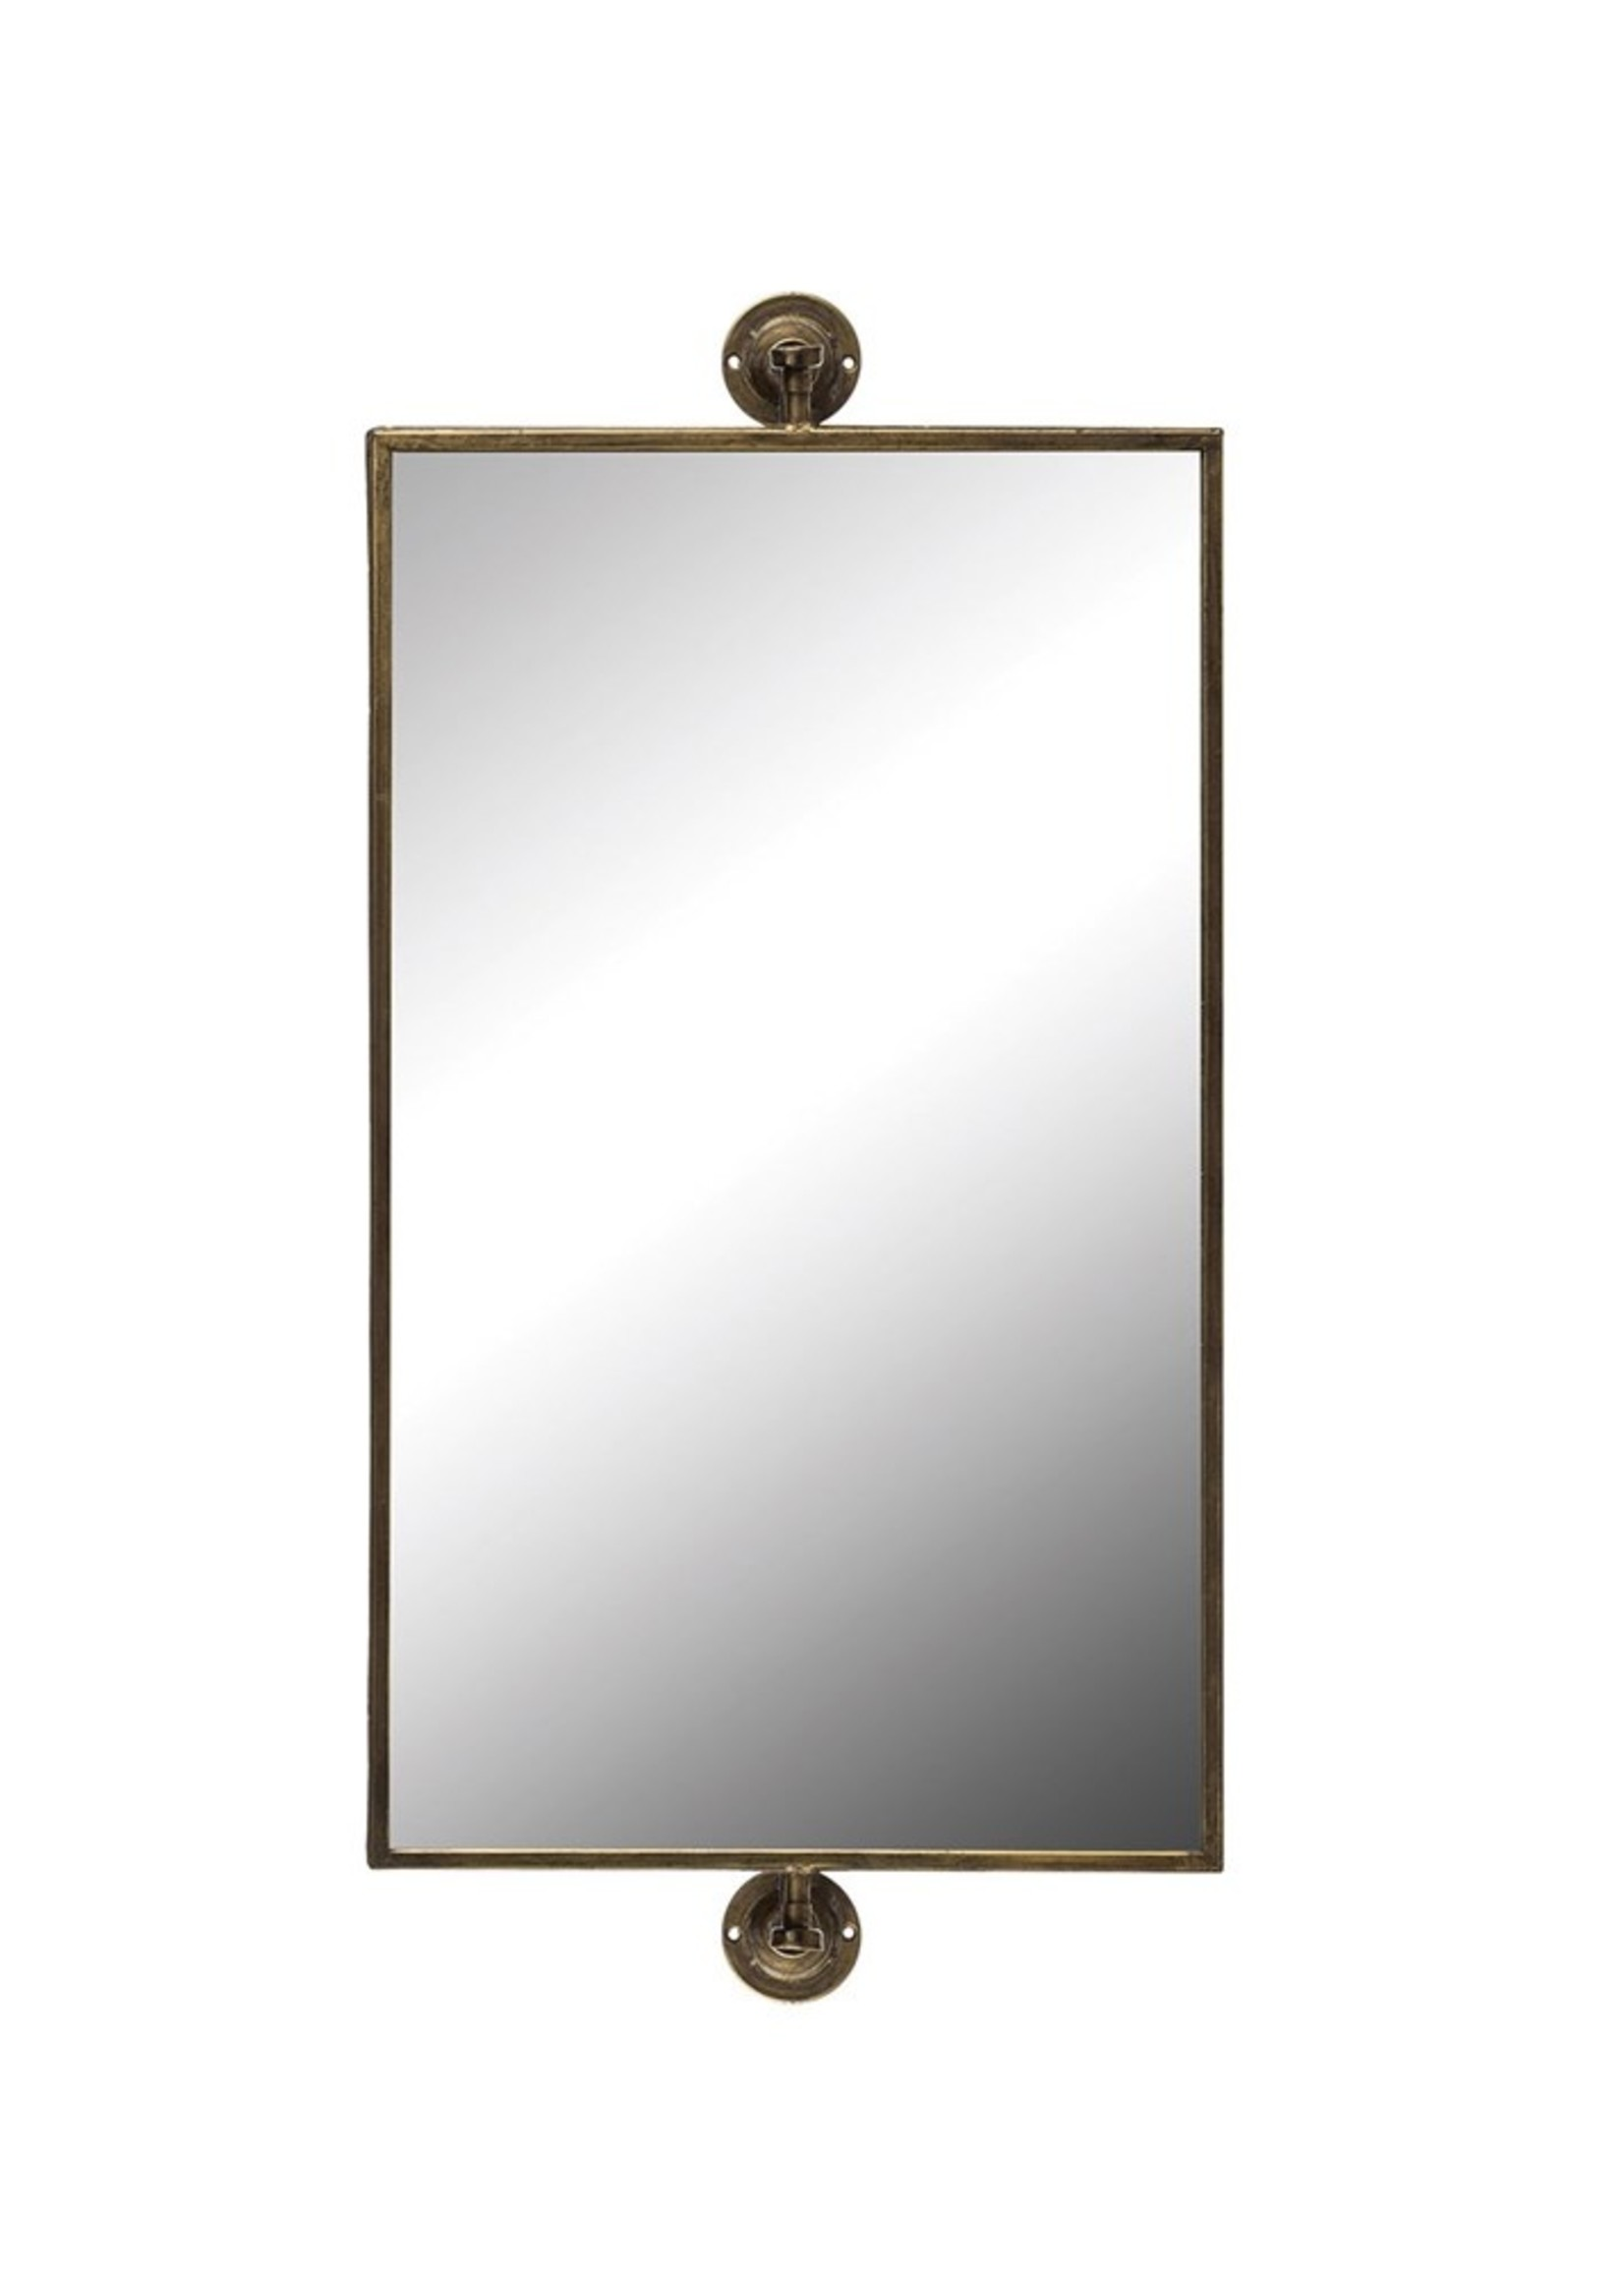 Metal Swivel Wall Mirror, Antique Gold Finish (Hangs Vertically & Horizontally)